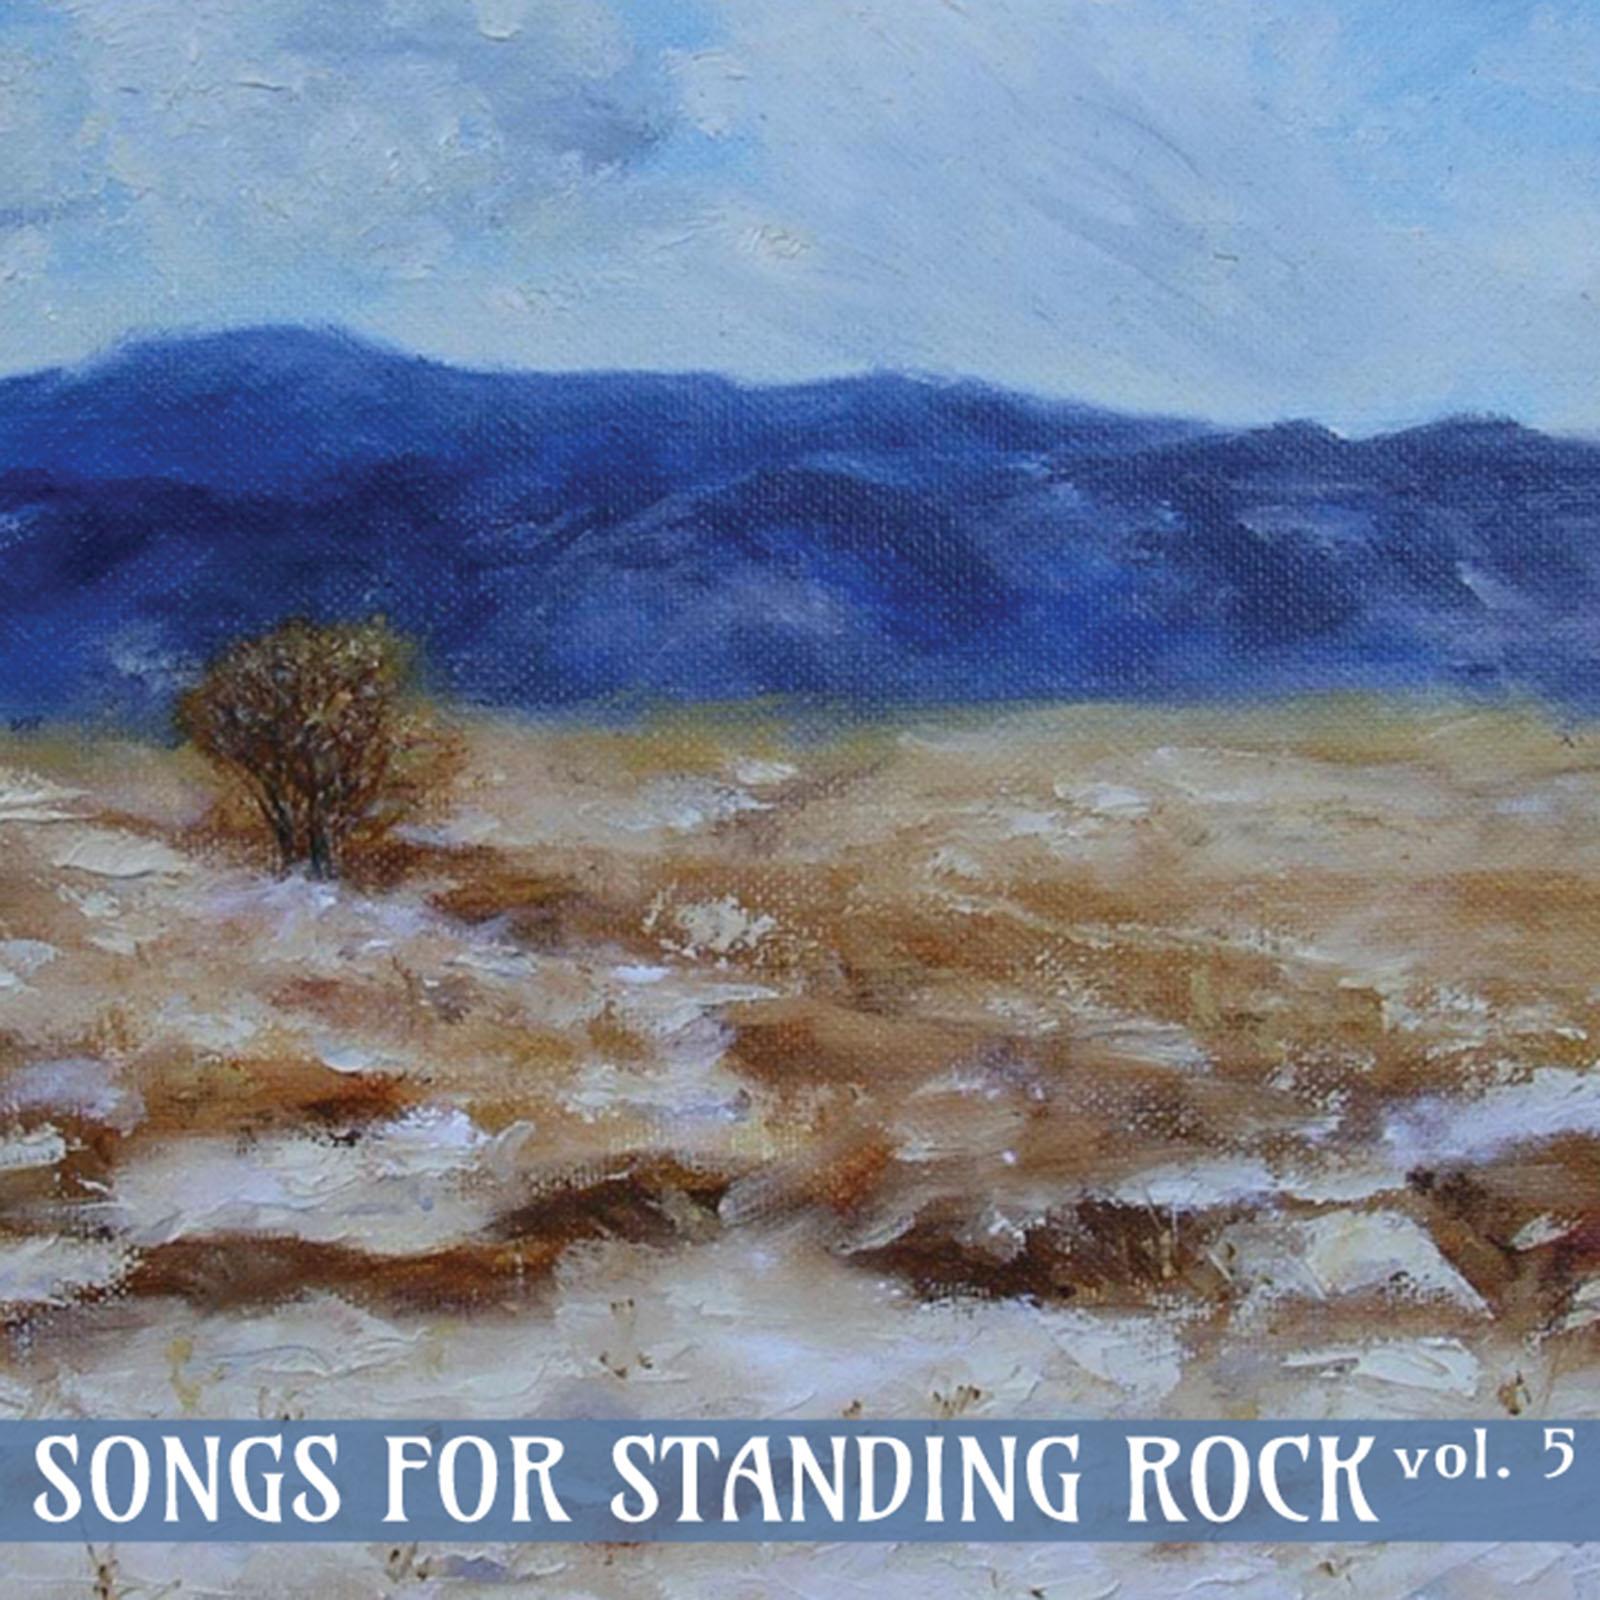 Songs for Standing Rock Vol. 5_cover-01.jpg